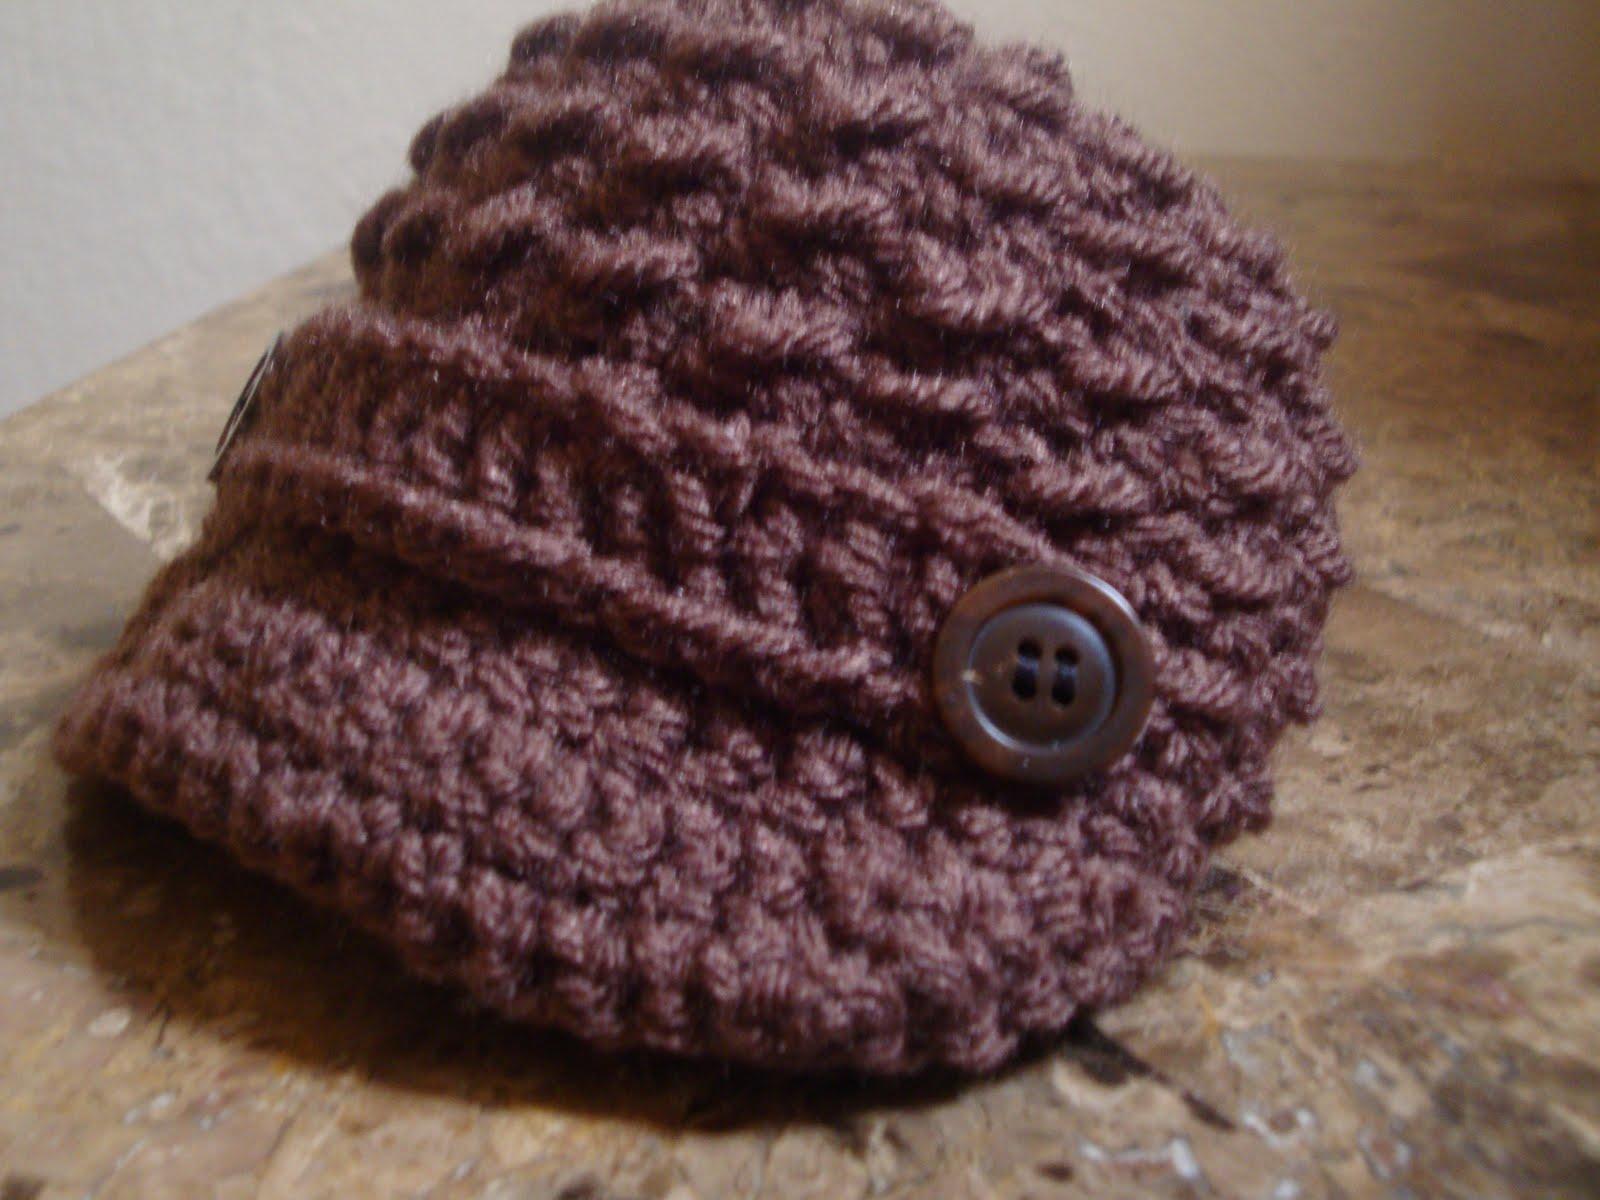 FREE CROCHET PATTERN/NEWSBOY CAP - Crochet and Knitting Patterns